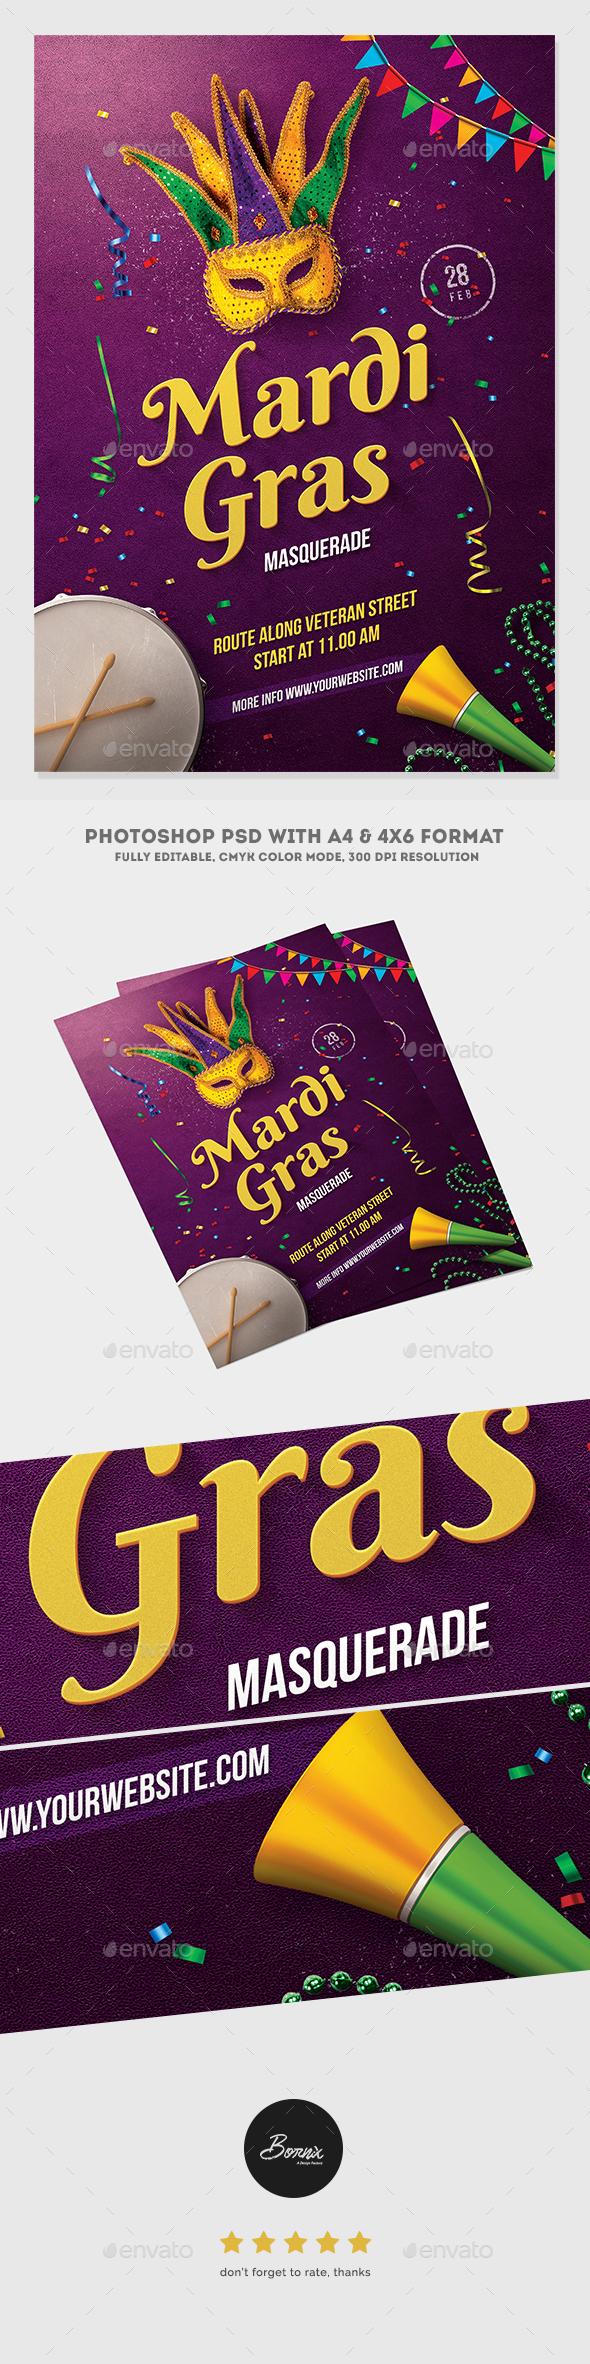 Mardi Gras Masquerade Flyer - Events Flyers